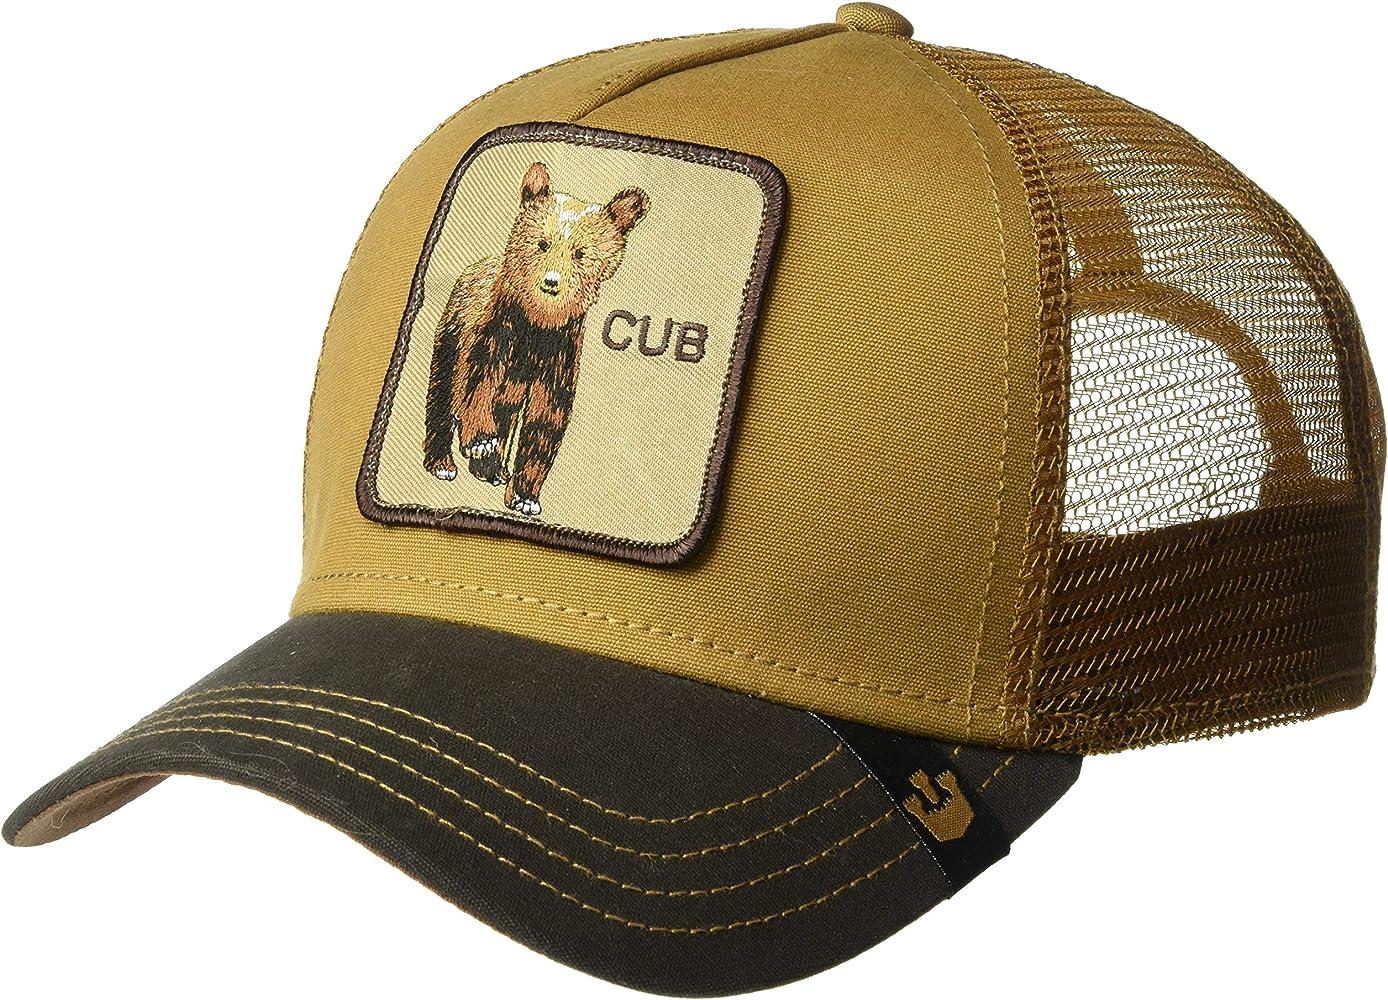 9fc383ad8fcb3e Goorin Bros. Men's Animal Farm Trucker Hat at Amazon Men's Clothing ...